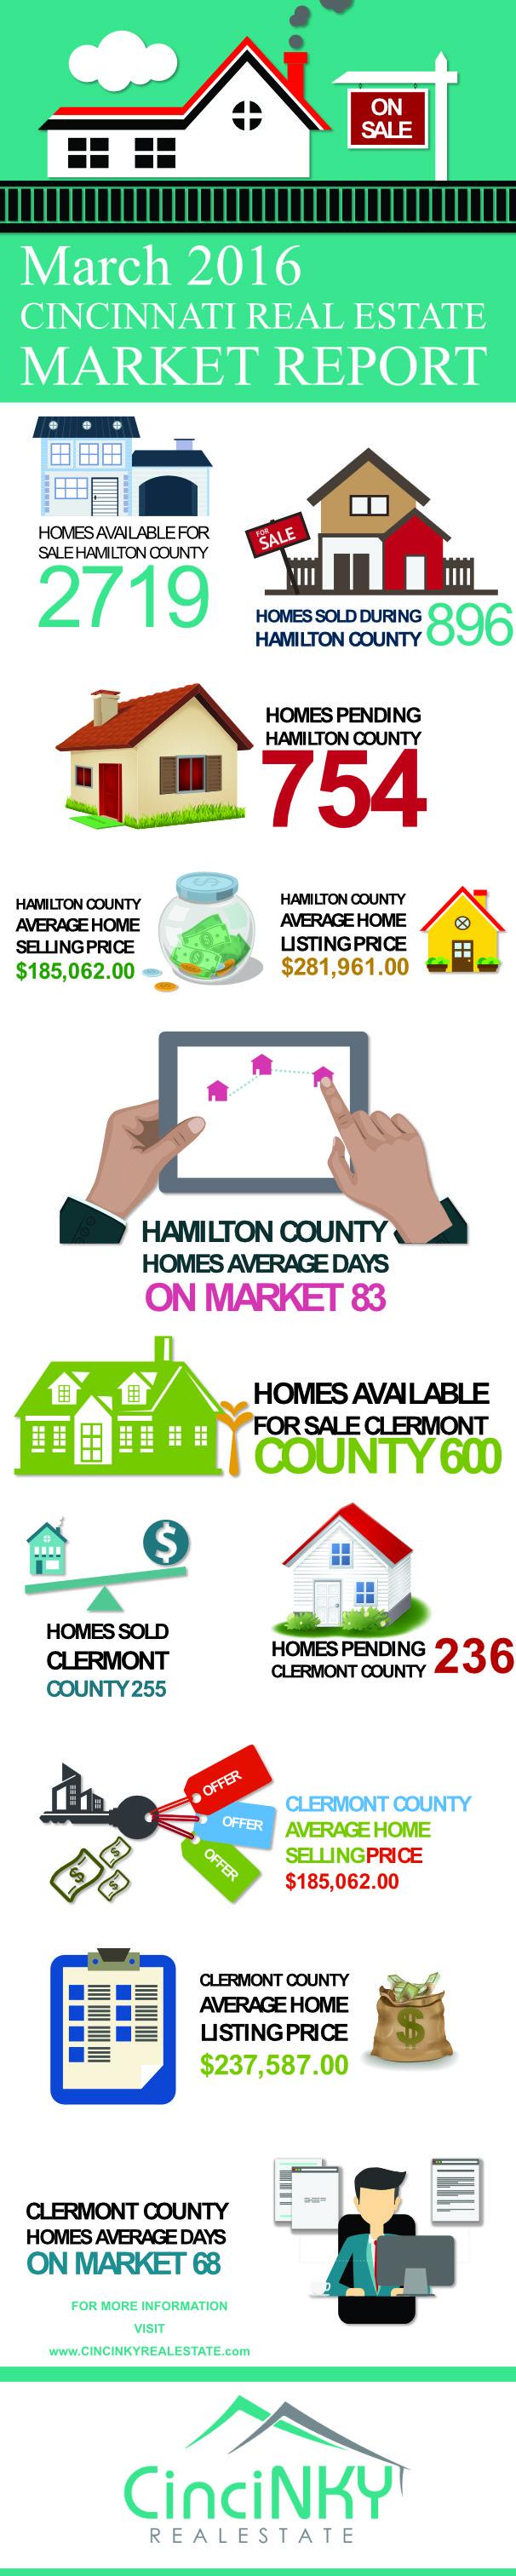 march 2016 great cincinnati real estate market report infographic